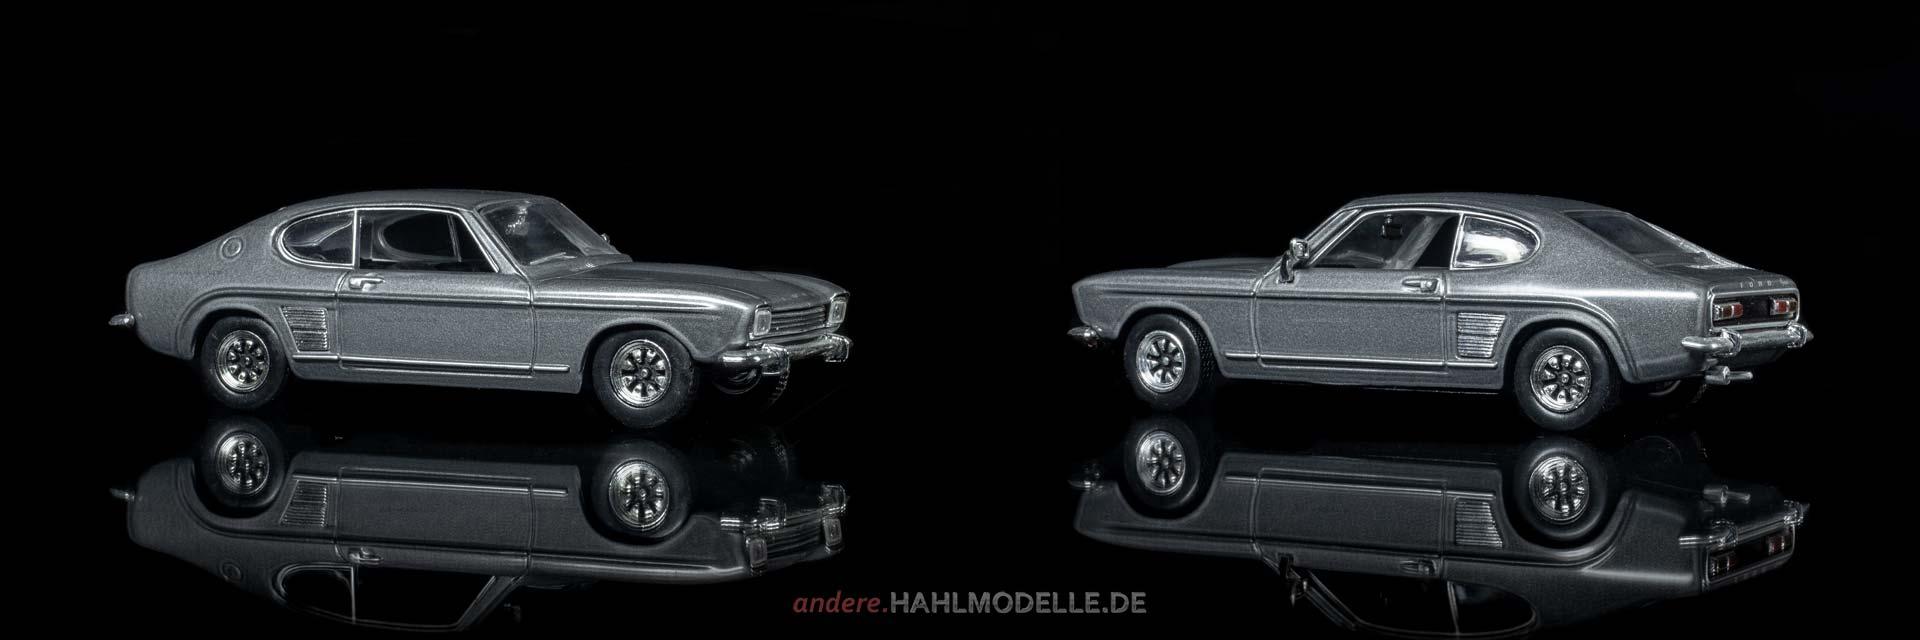 Ford Capri I (Capri *69) | Coupé | Ixo | 1:43 | www.andere.hahlmodelle.de